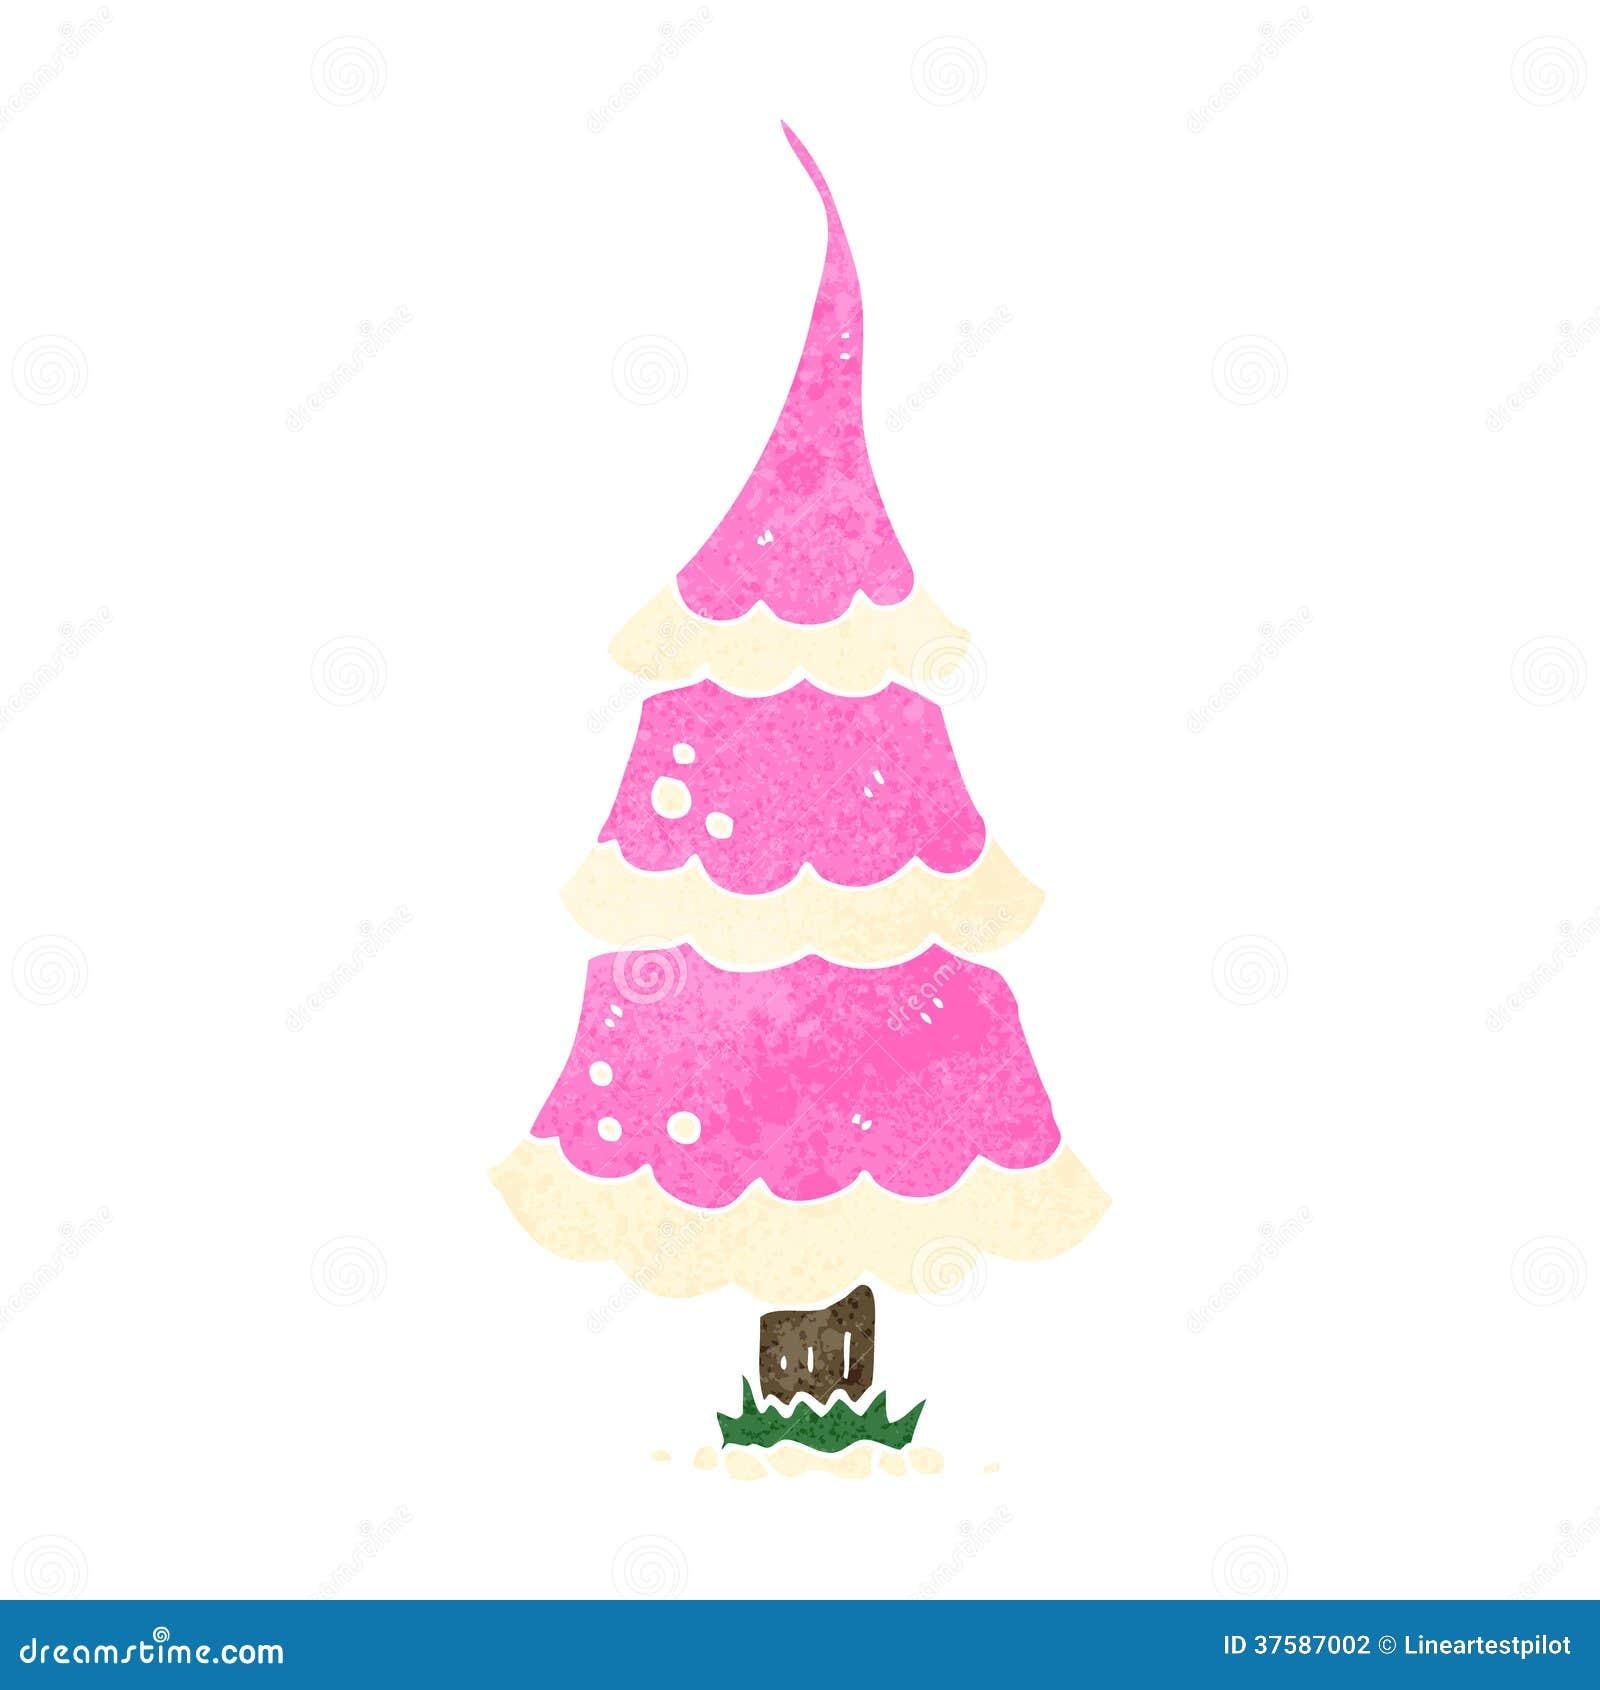 Rosa Weihnachtsbaum.Retro Karikatur Rosa Weihnachtsbaum Vektor Abbildung